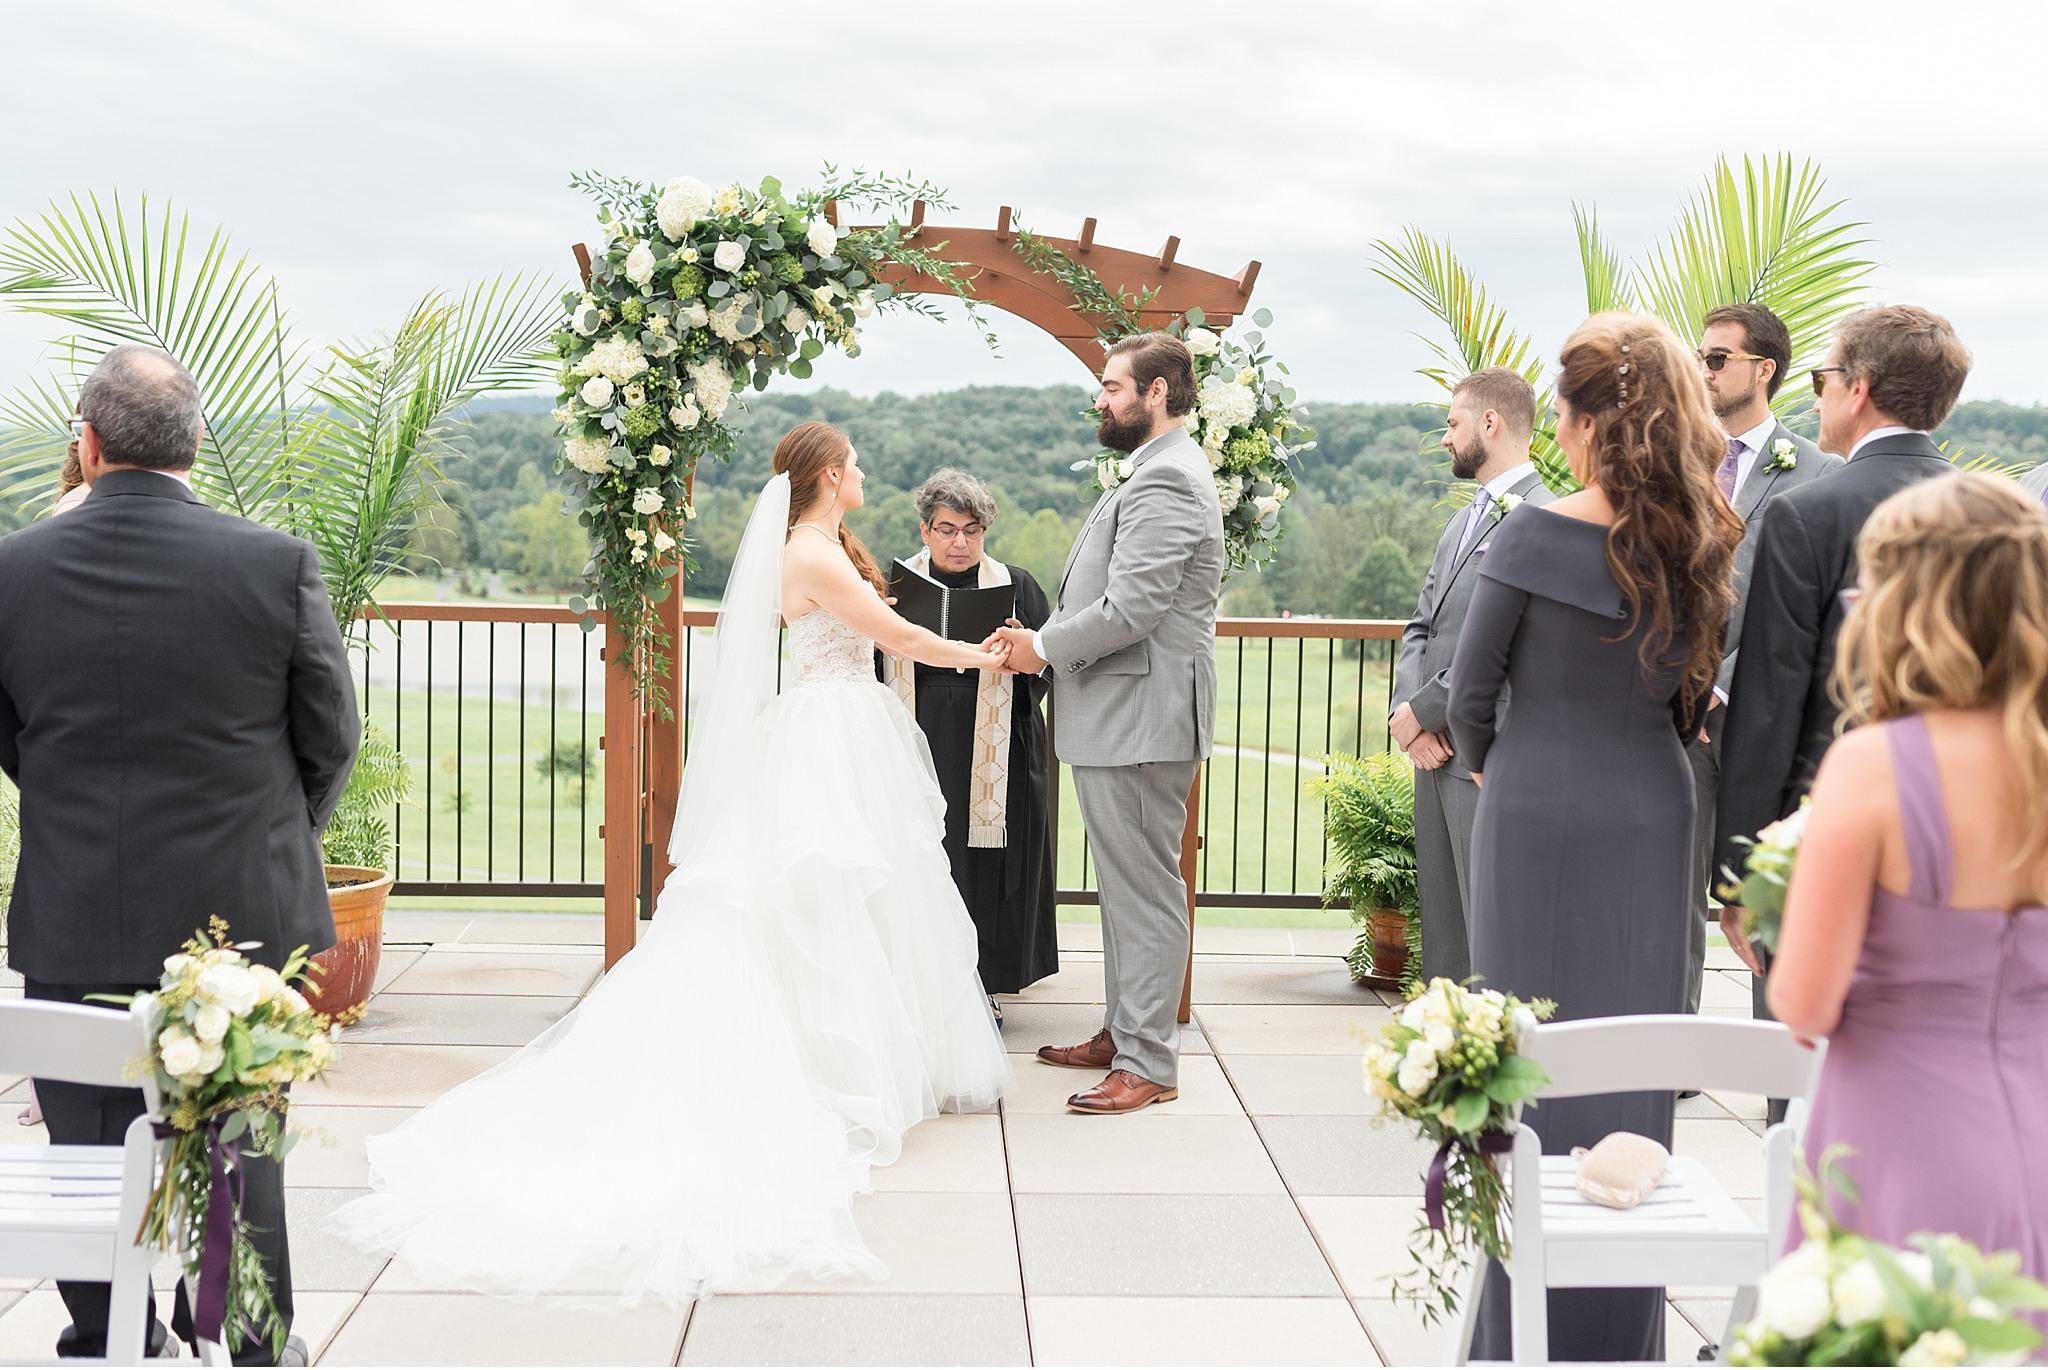 Elegant Ski Liberty Resort Fairfiled PA wedding photography photo_2187.jpg